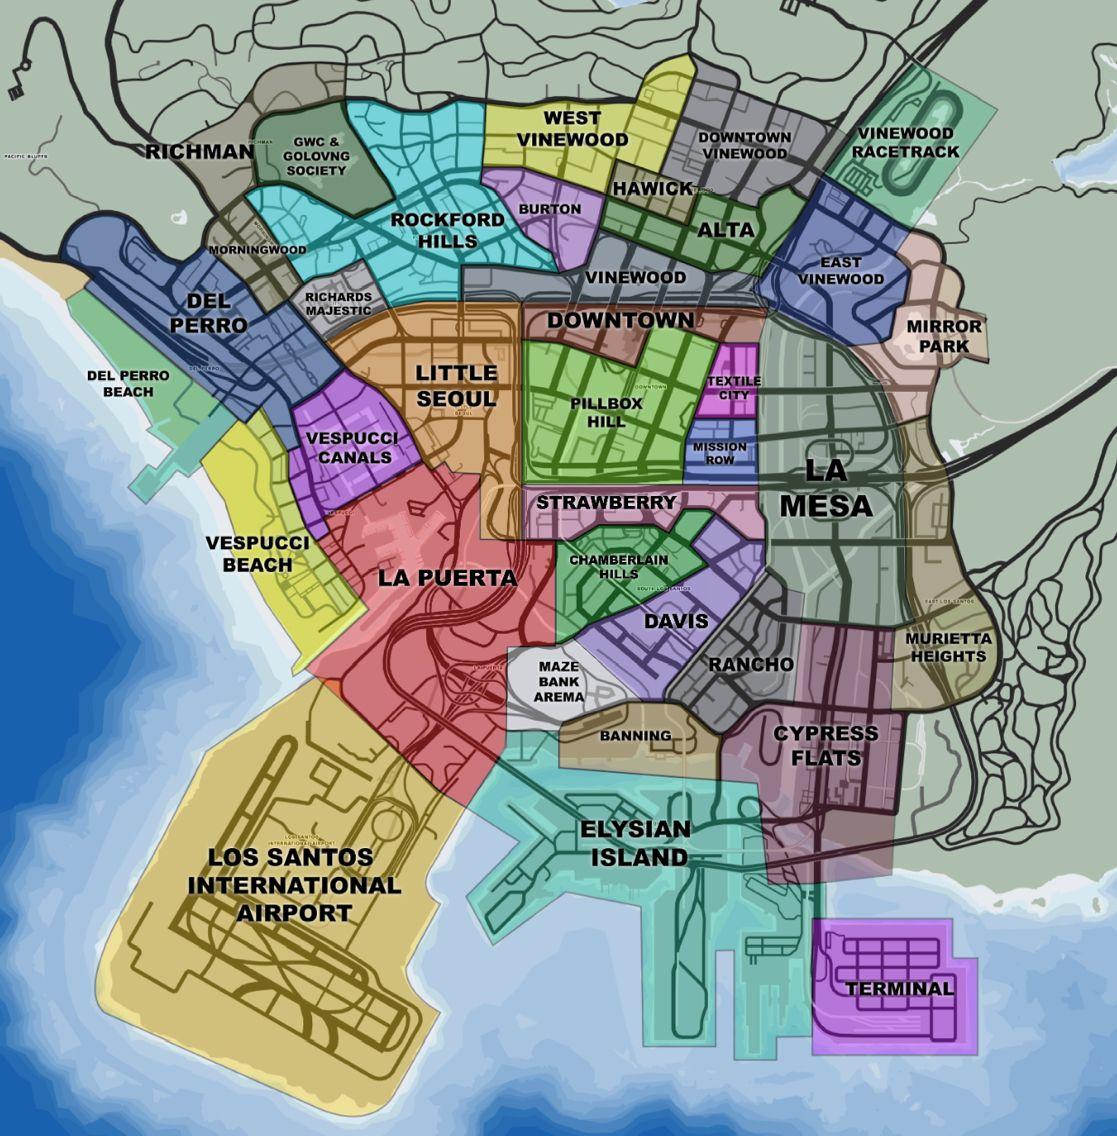 GTA Los Antos Video Games Pinterest Video Games - Los angeles geography map